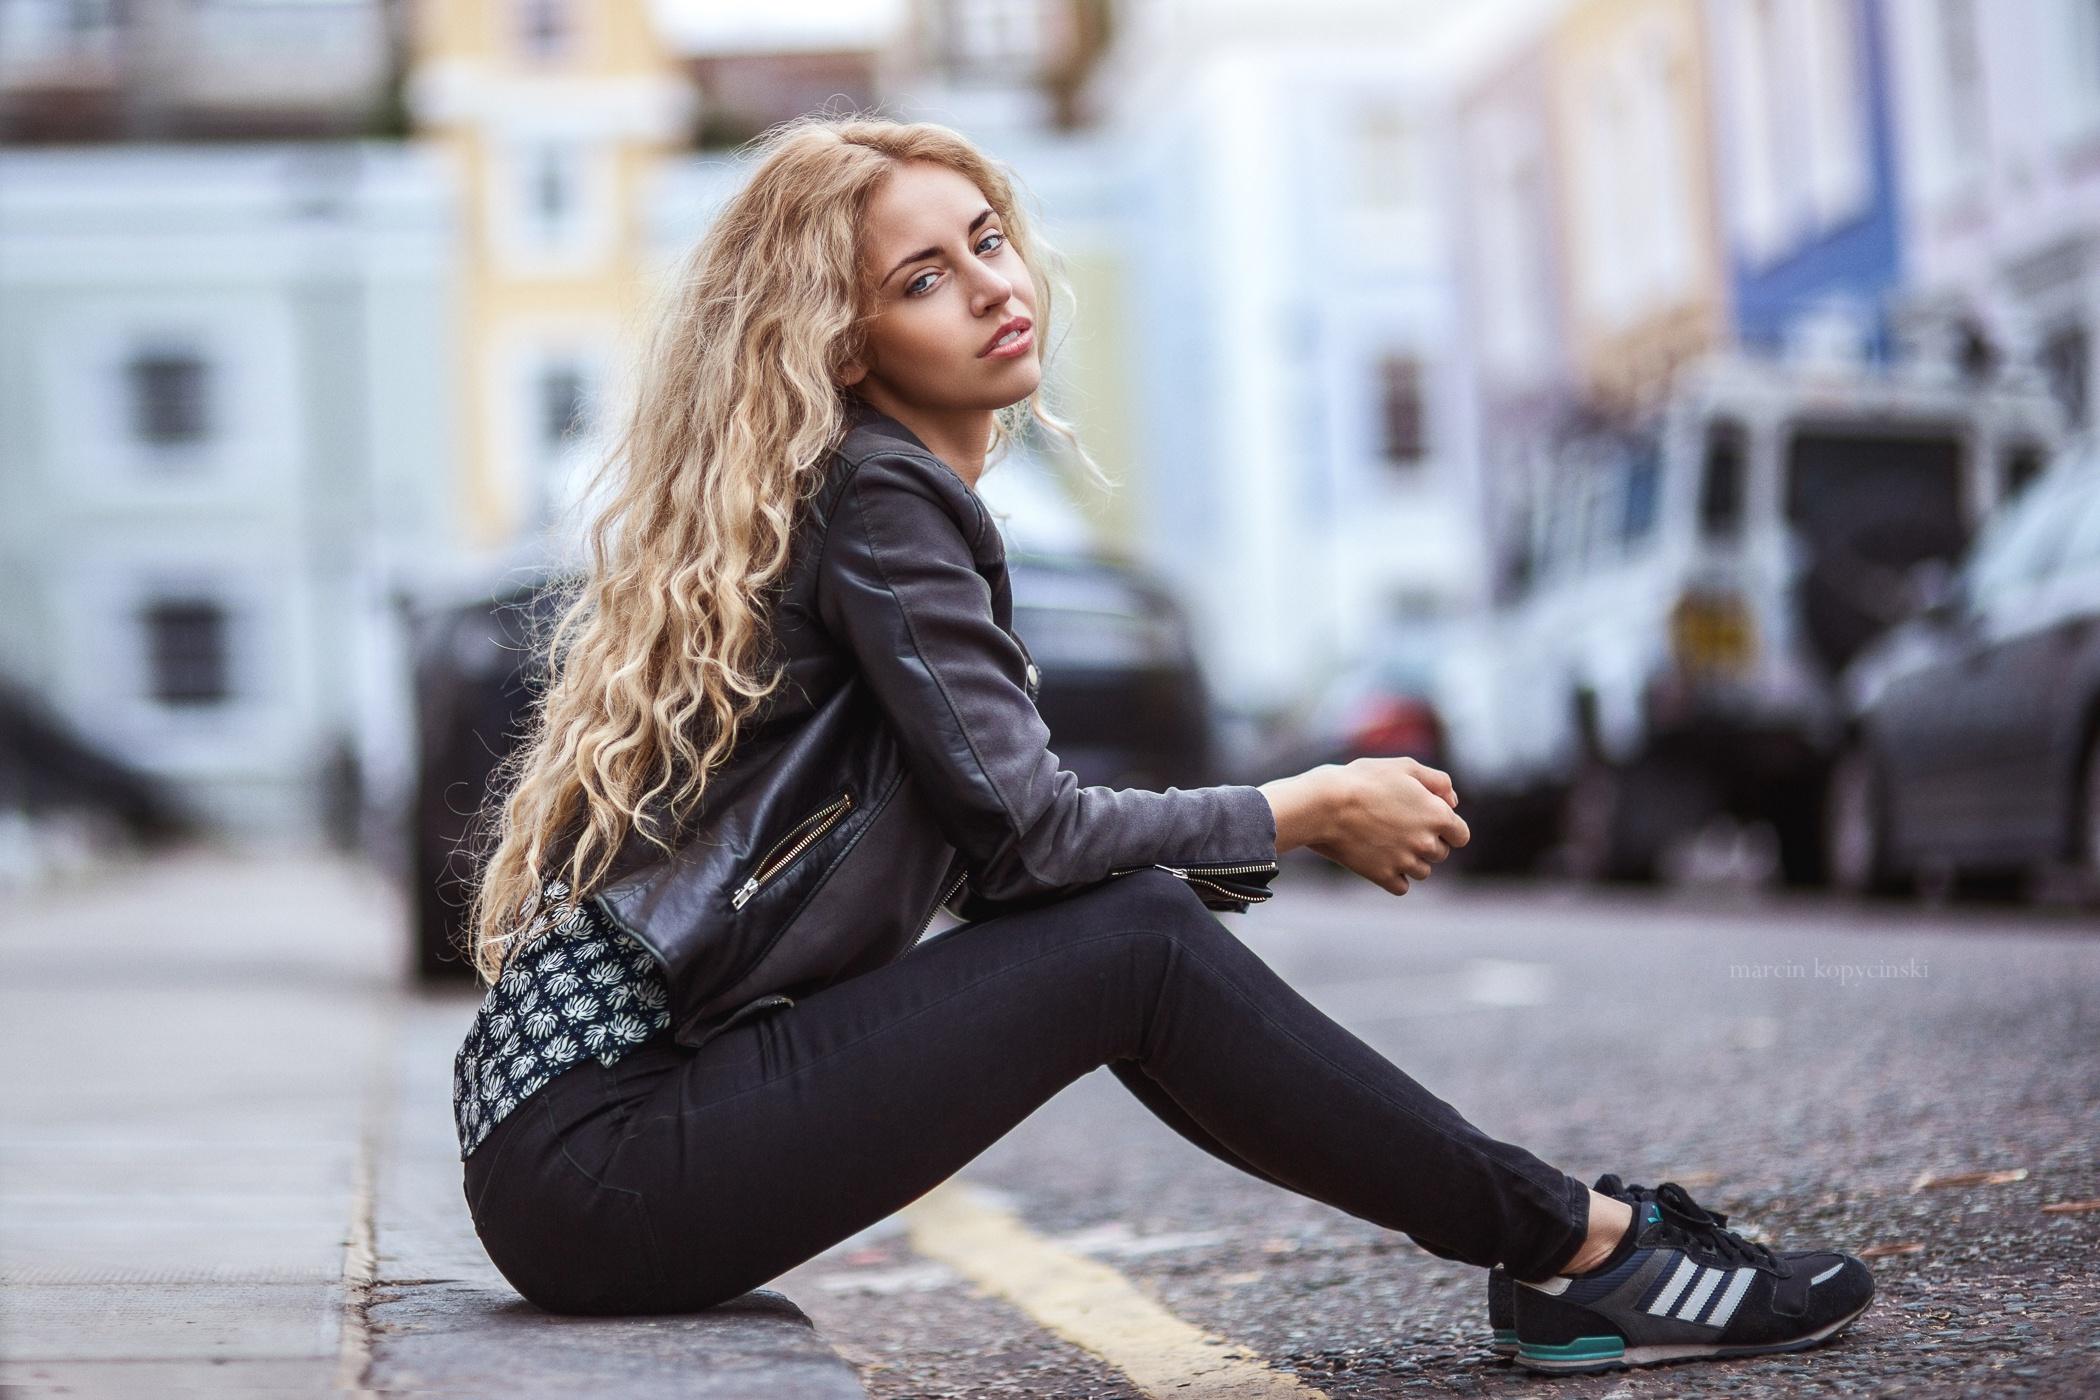 Model Sitting Women Urban Women Outdoors Long Hair Street Asphalt Looking At Viewer Blonde Makeup Dy 2100x1400